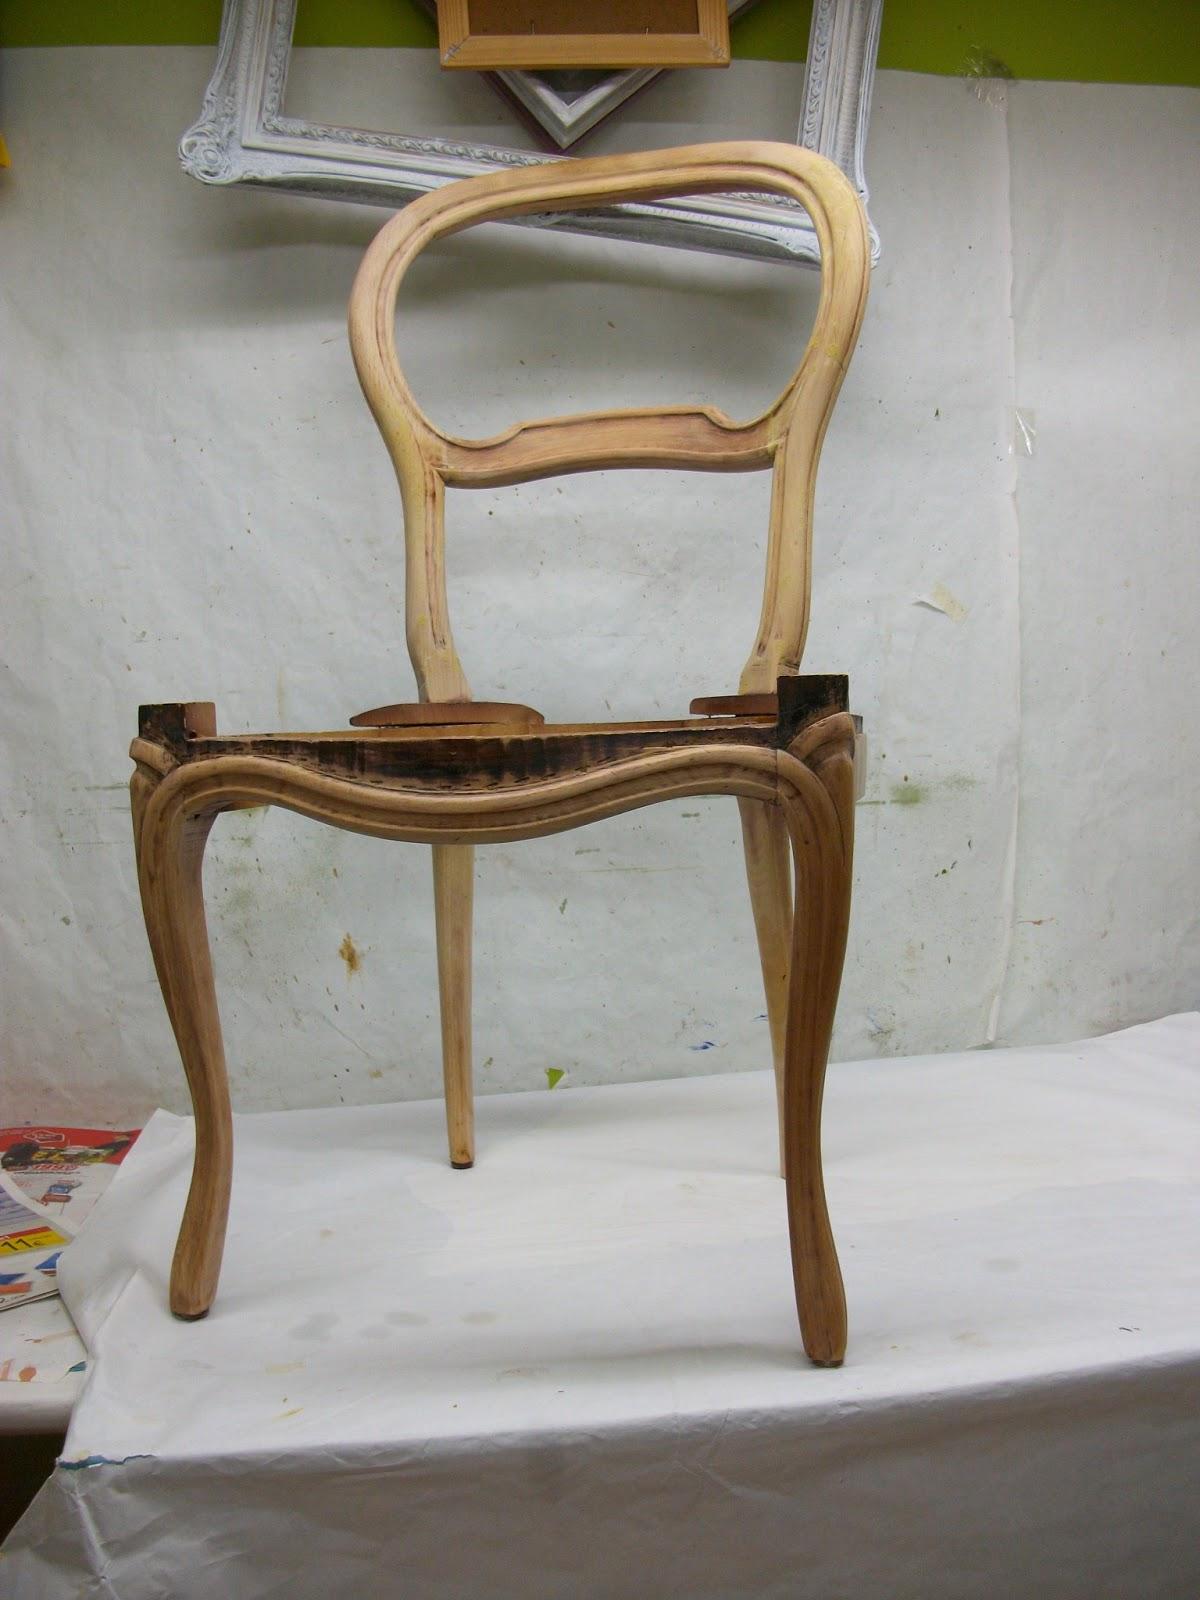 Restauraci n el palisandro restauraci n reconversi n y - Tapizado de silla ...